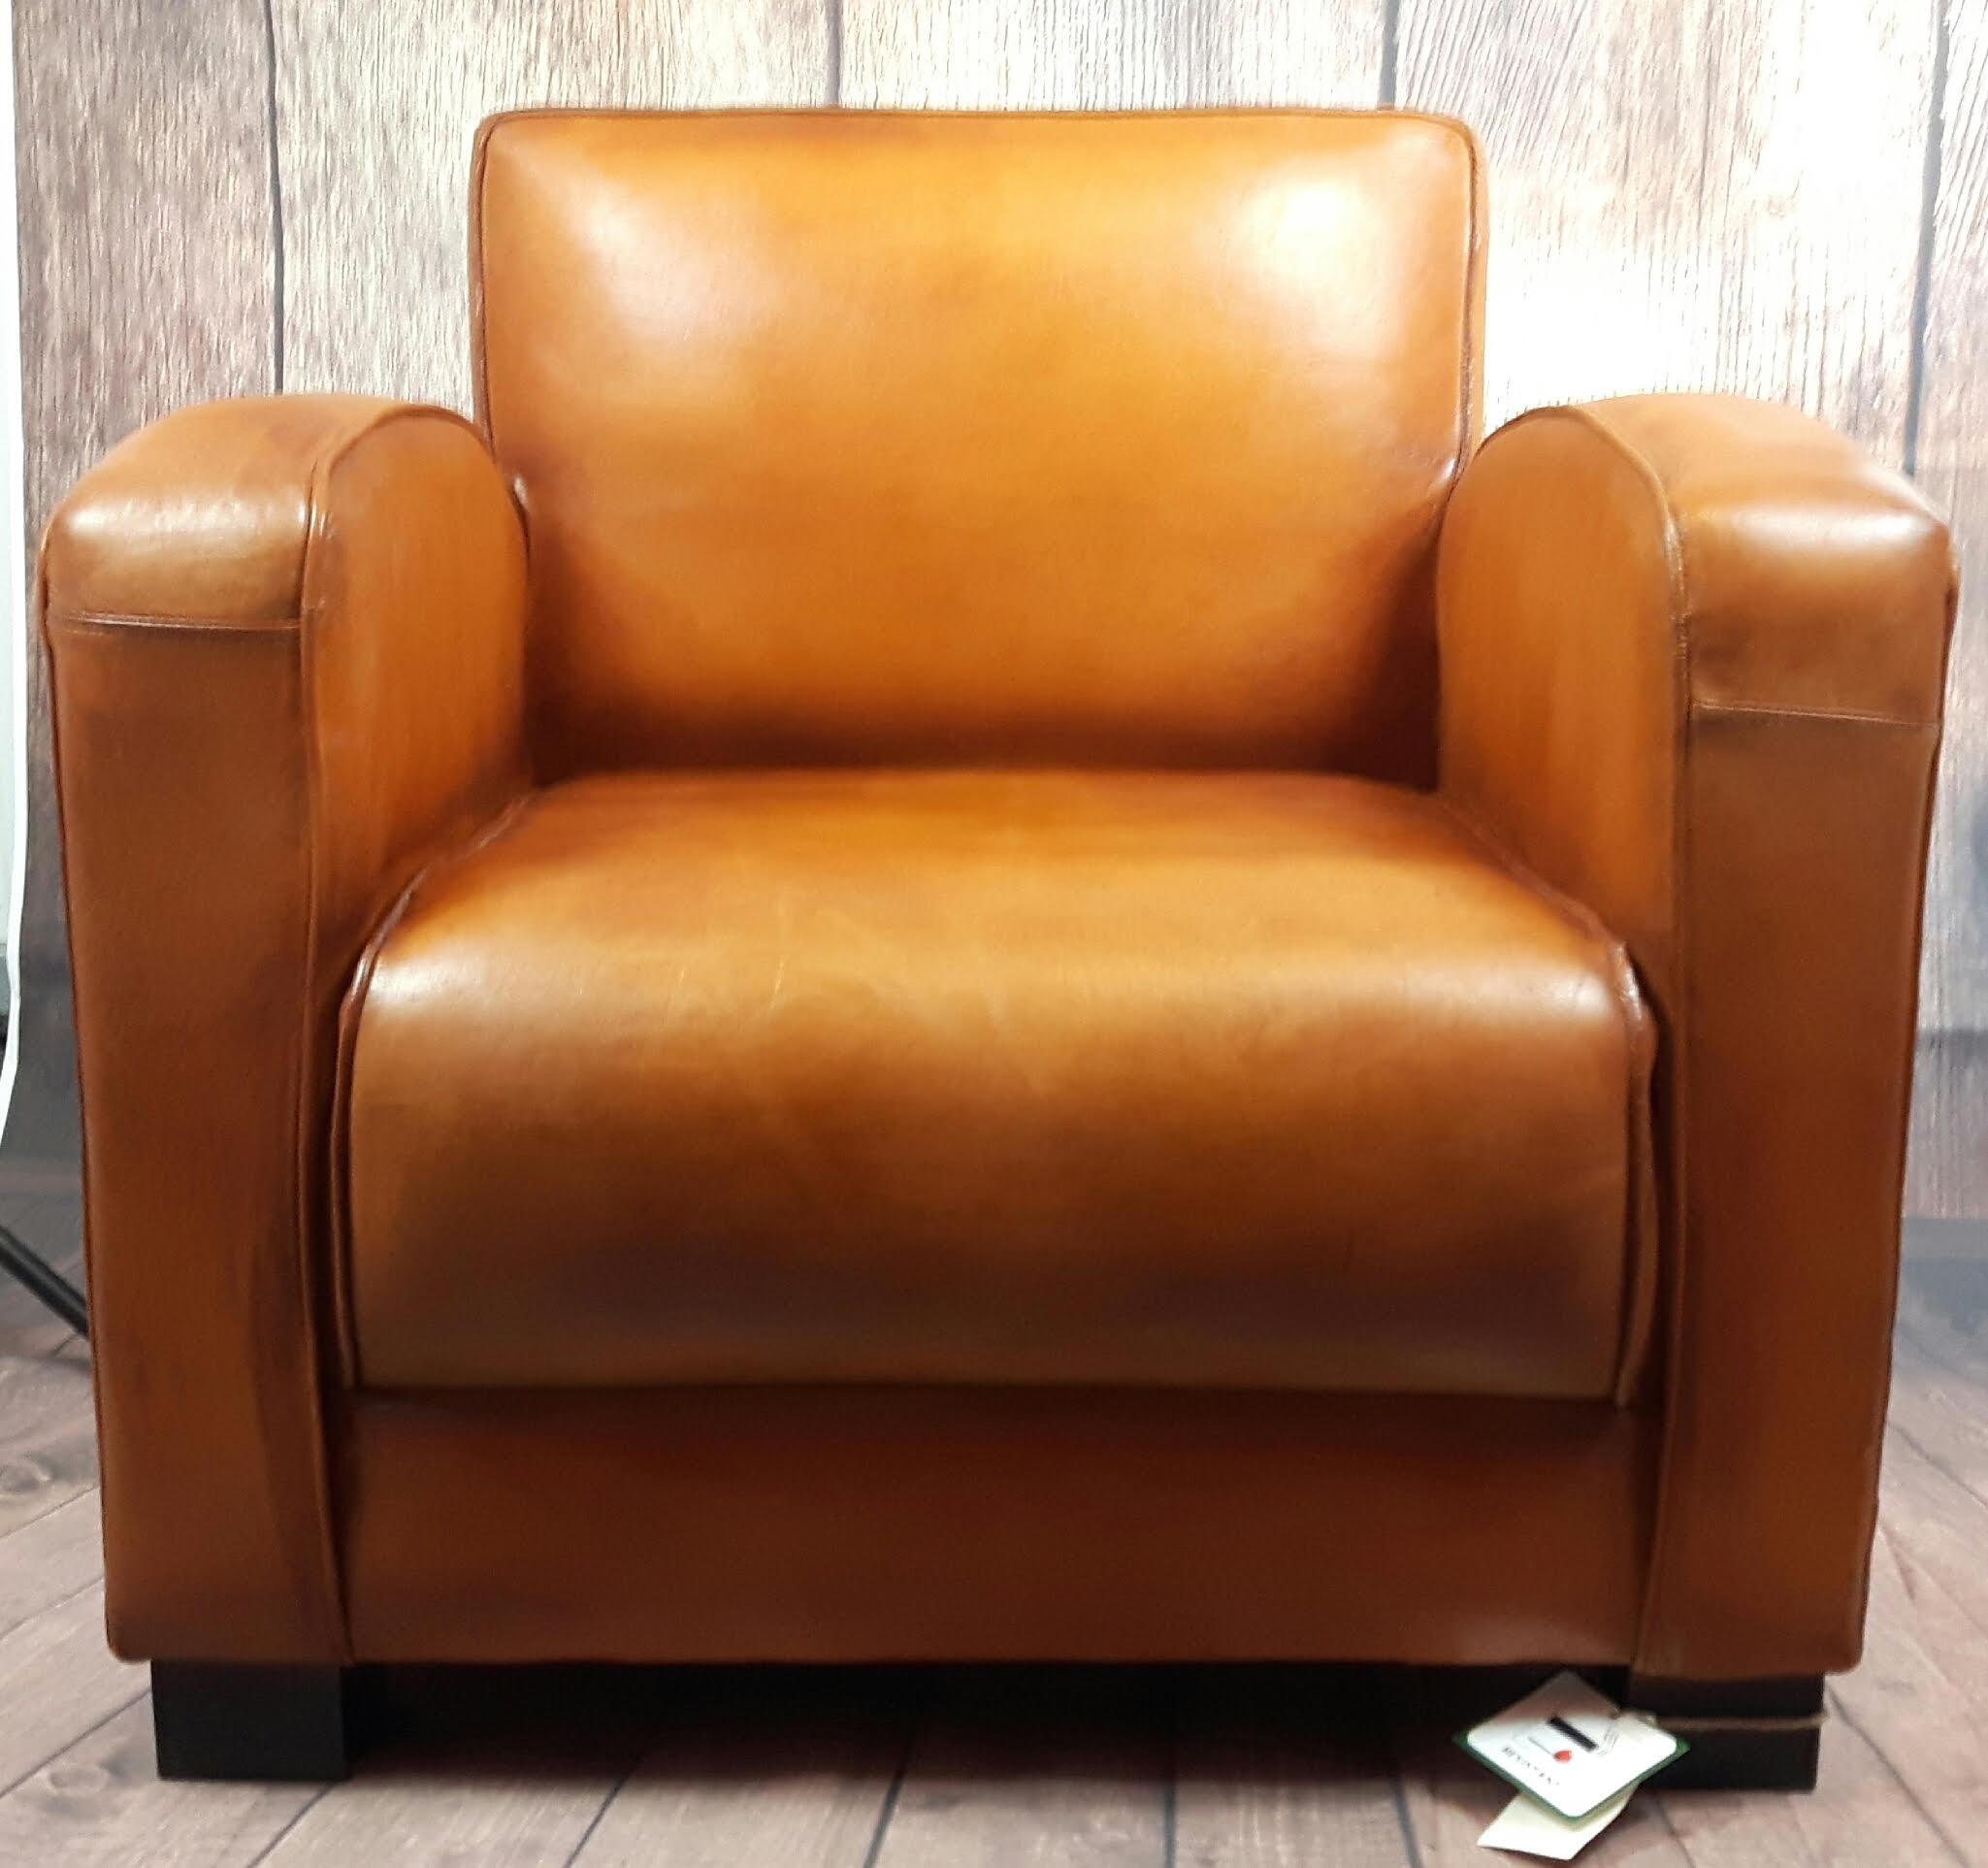 Tremendous Retro Leather Club Chair Dailytribune Chair Design For Home Dailytribuneorg